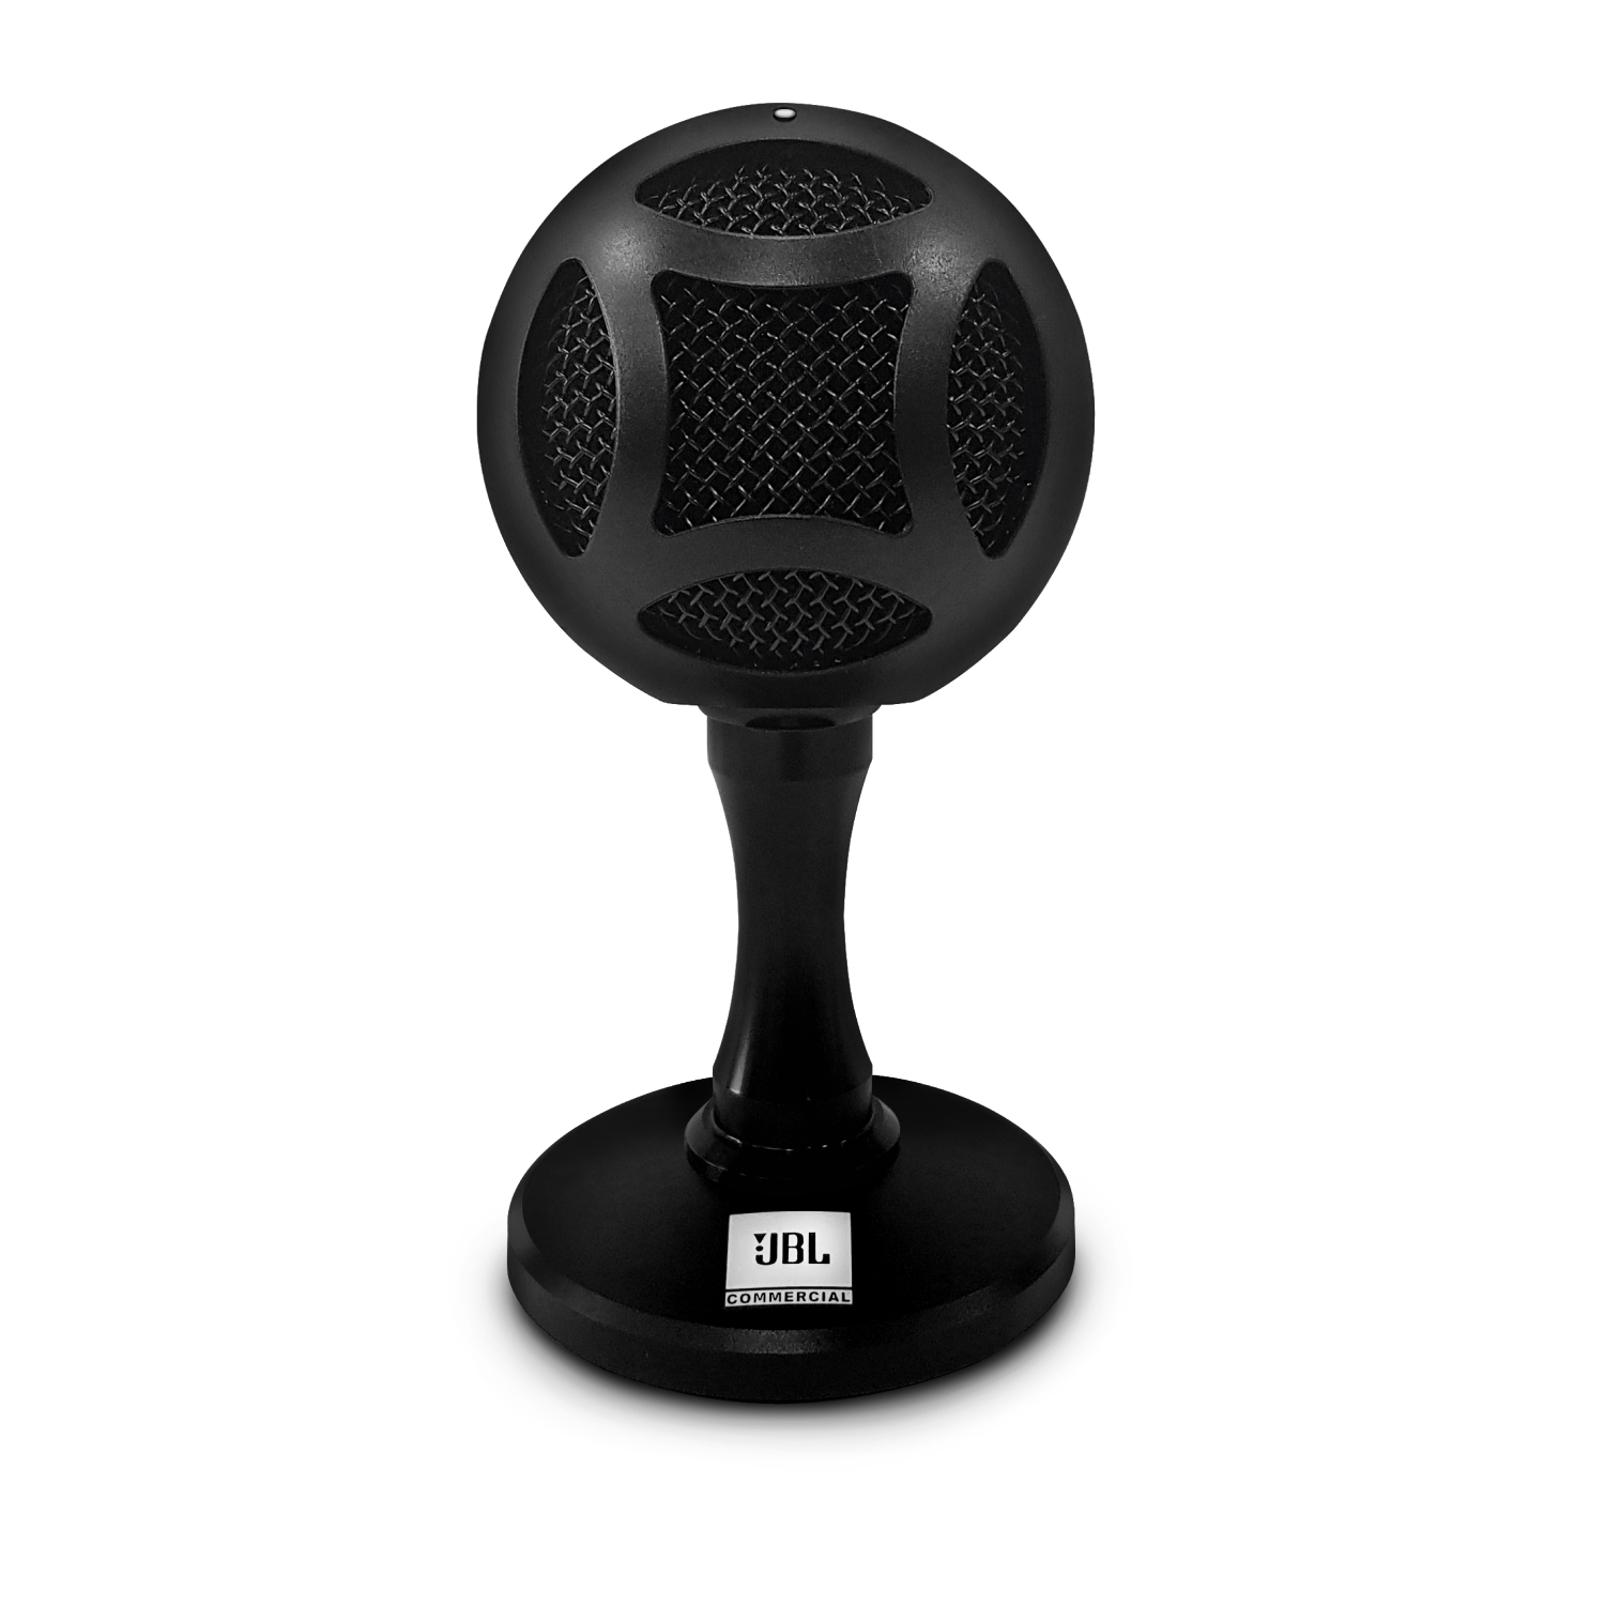 WFH100 - Black - USB powered speakers and Mini USB Microphone Bundle - Detailshot 3